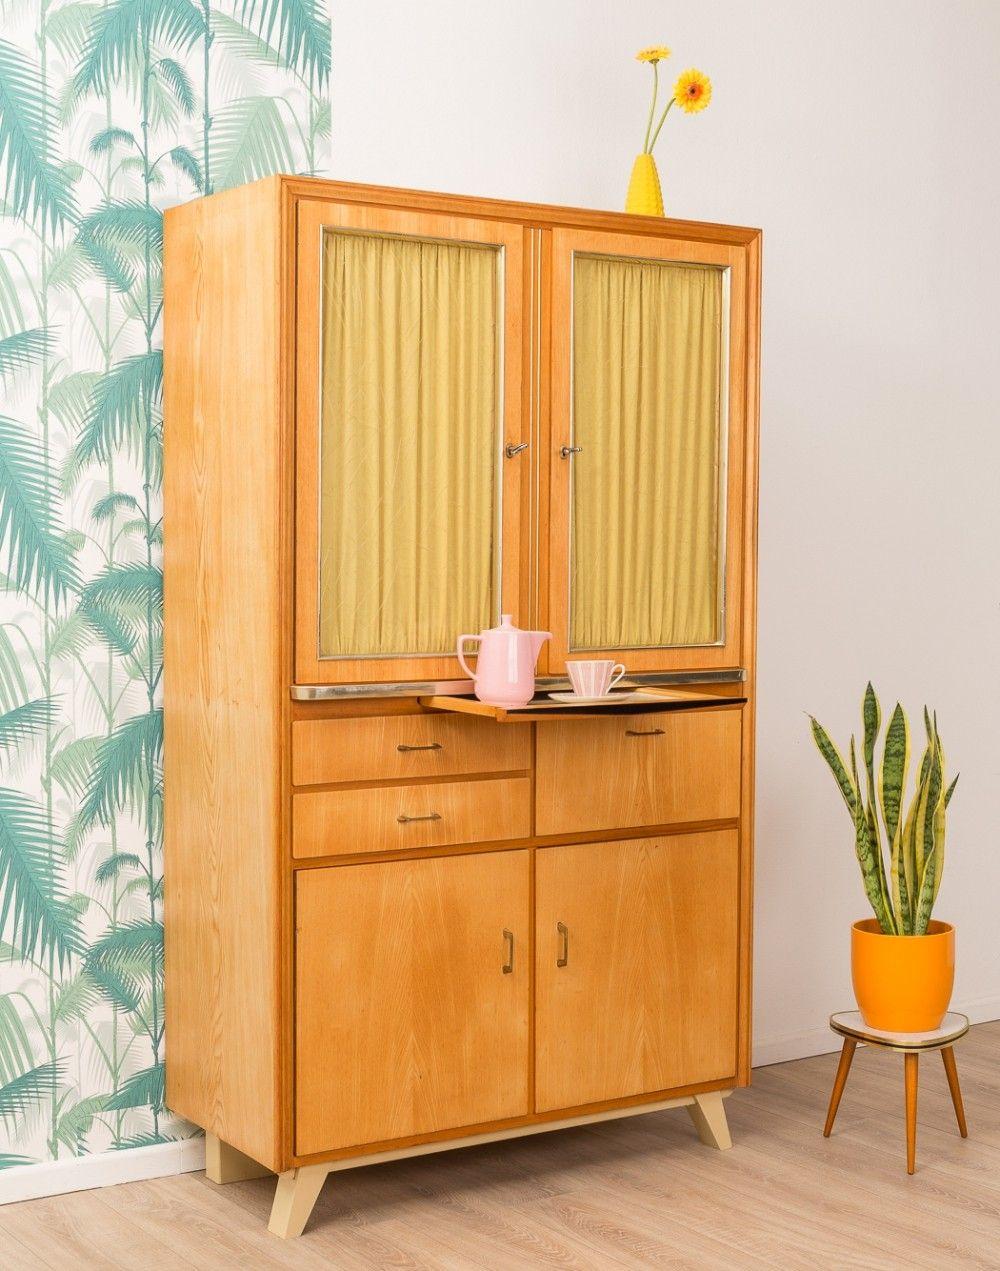 German Kitchen Cabinet From The 1950s Haus Deko Dekor Schrank Dekor